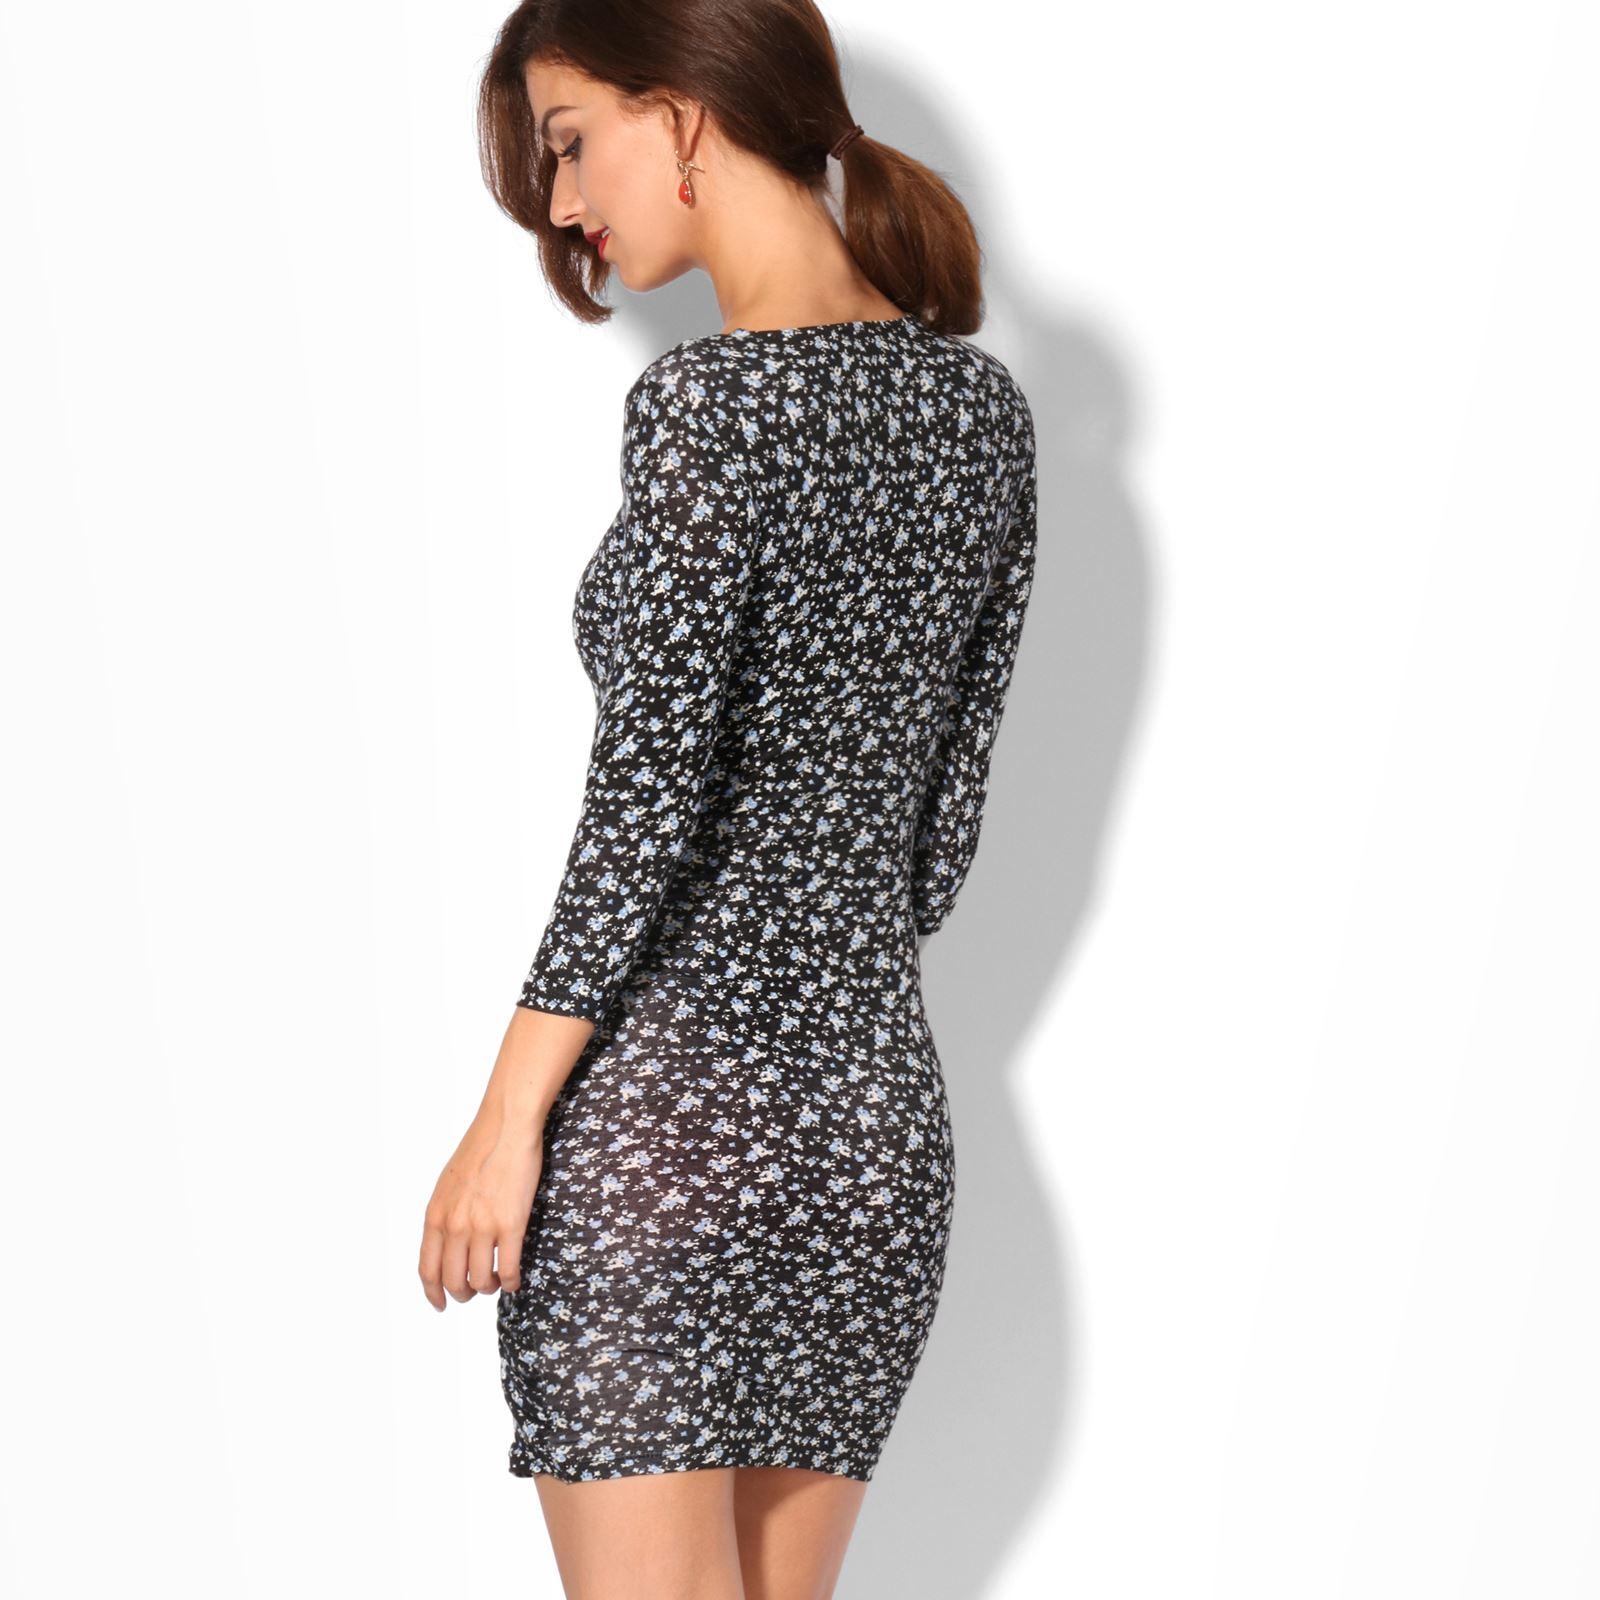 KRISP-Women-2-in-1-Boho-Gypsy-Tunic-Dress-Top-Tee-Jersey-Pleated-A-Line-Necklace thumbnail 4